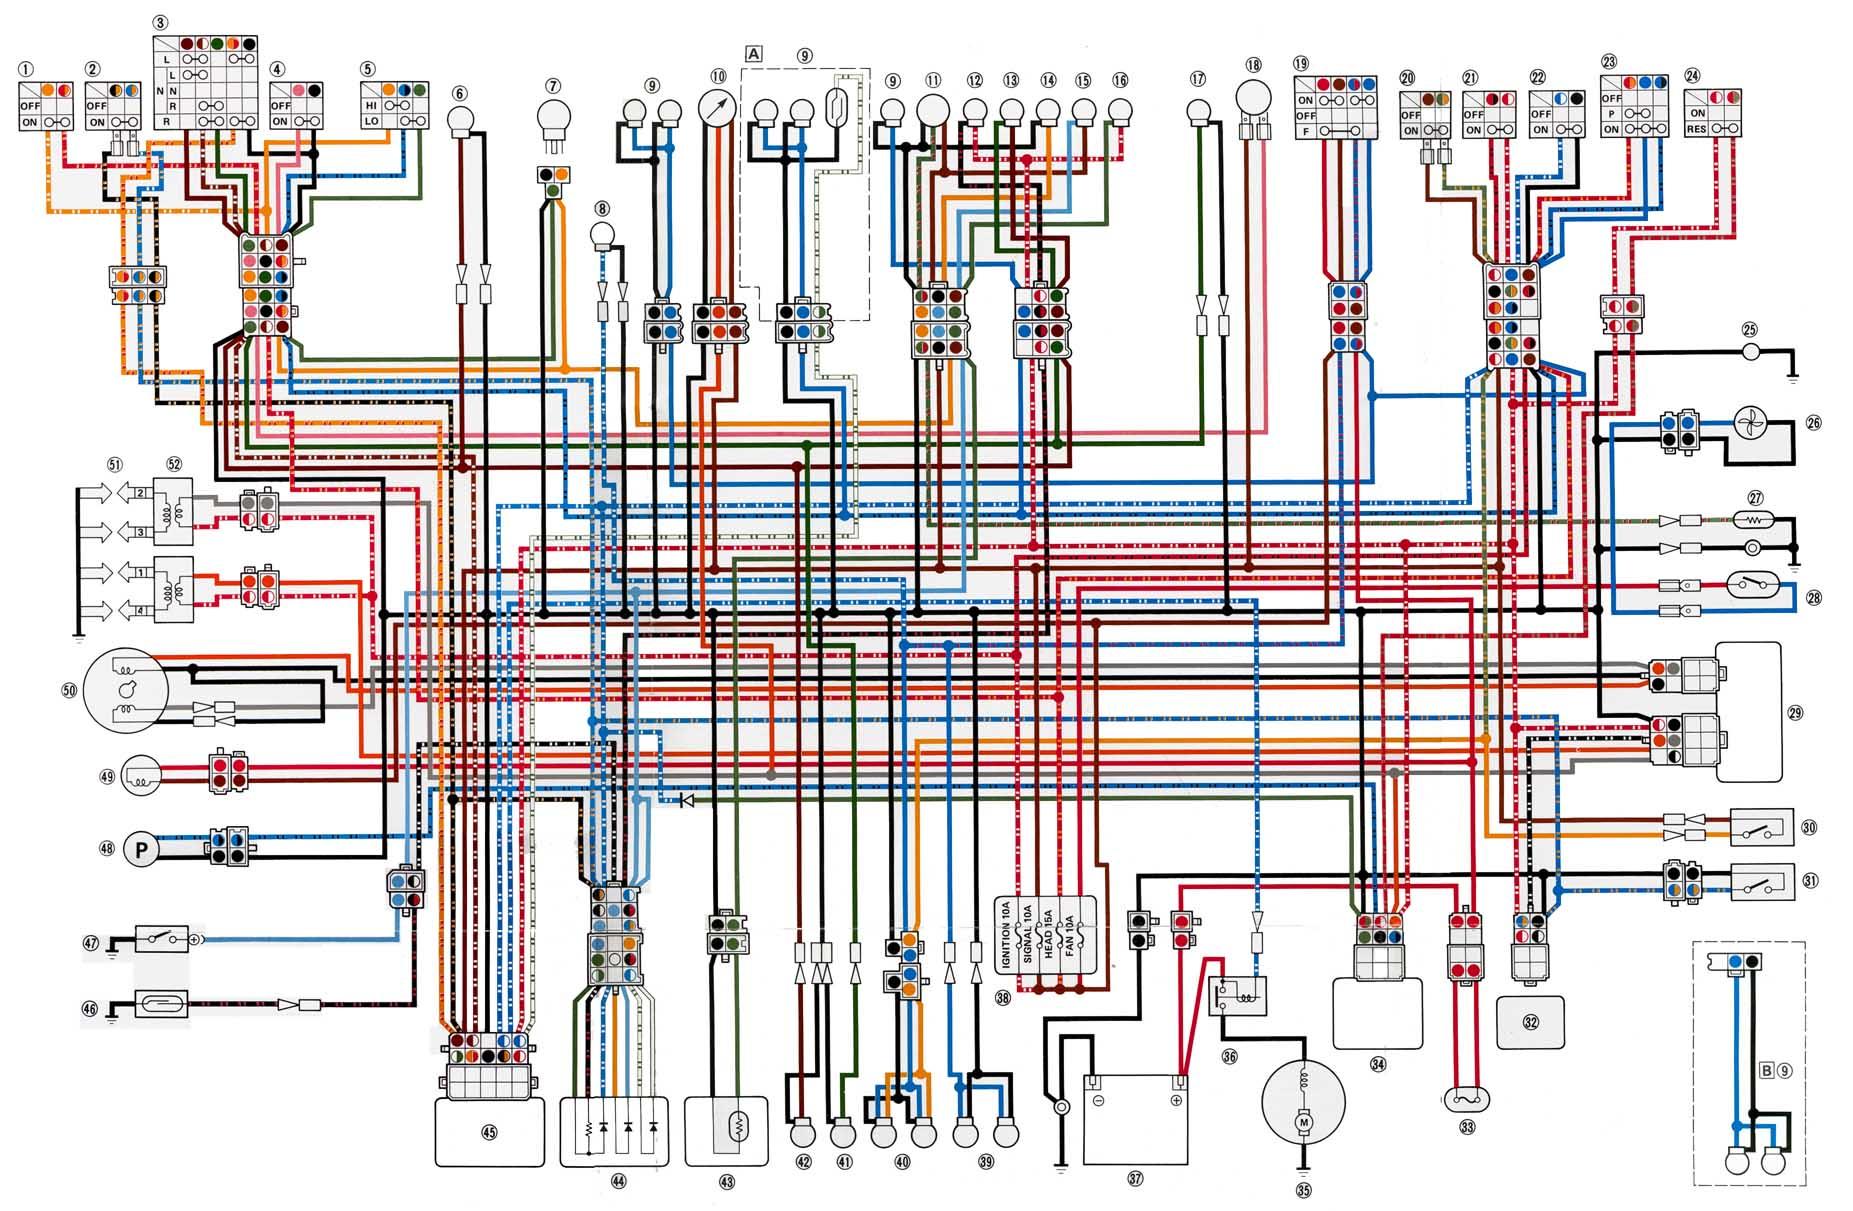 1fzx_3_00_fazertechstuff_04 diagram yamaha fzr 1000 wiring diagram file bj51263